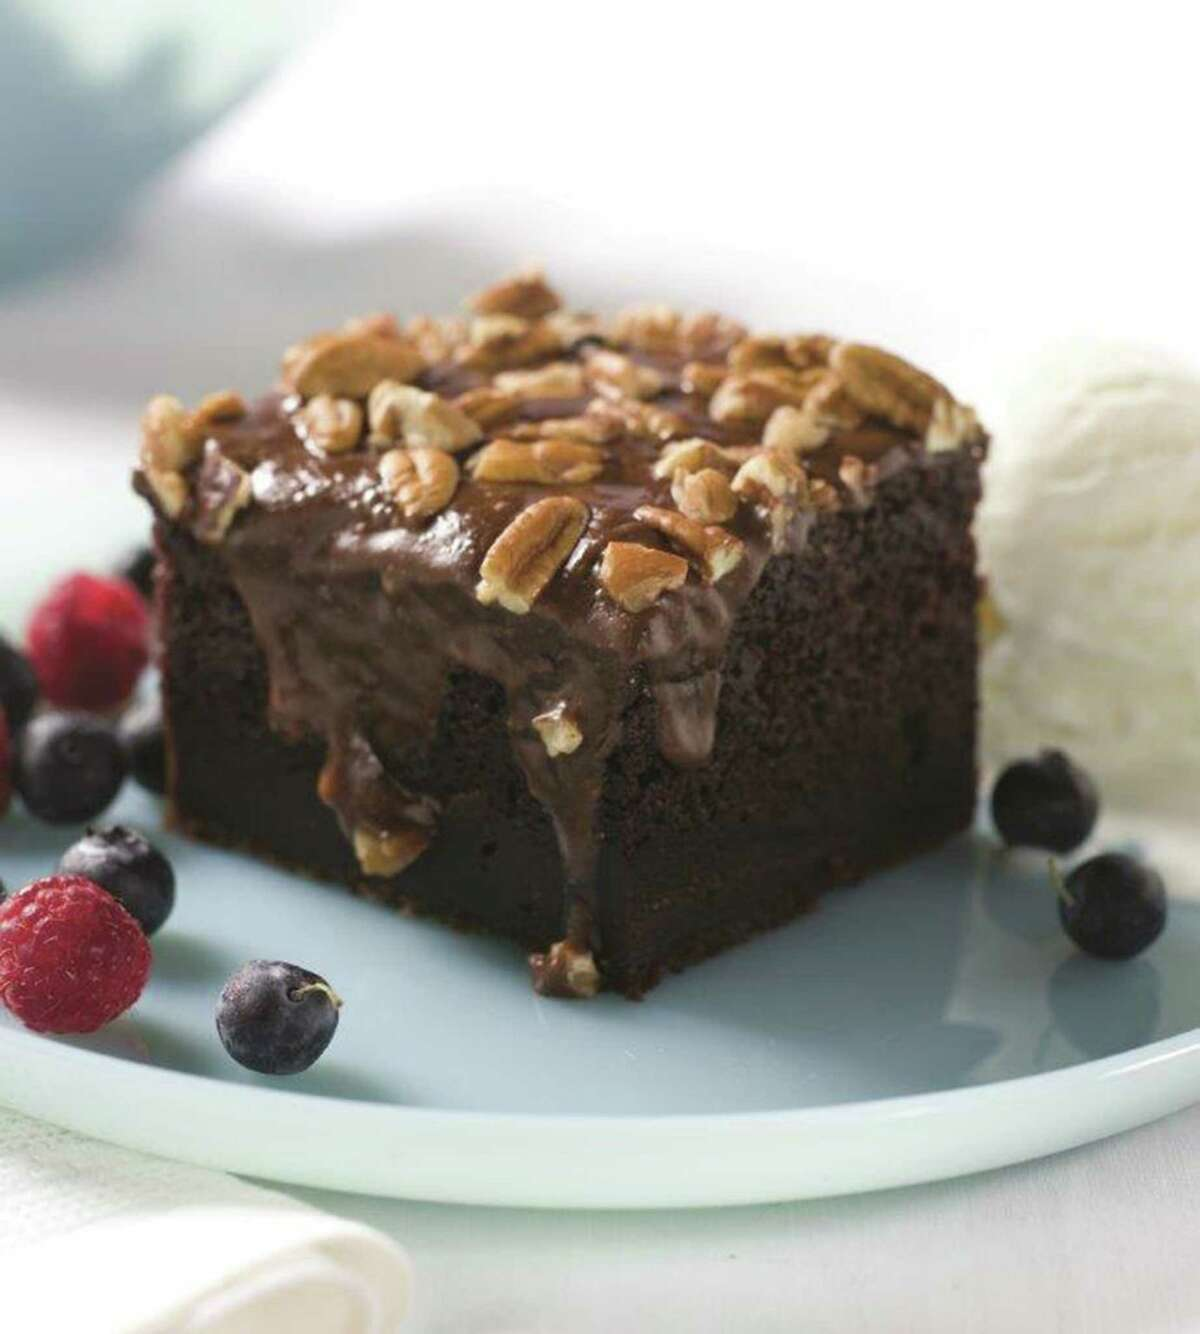 Cappy's Chocolate Cake